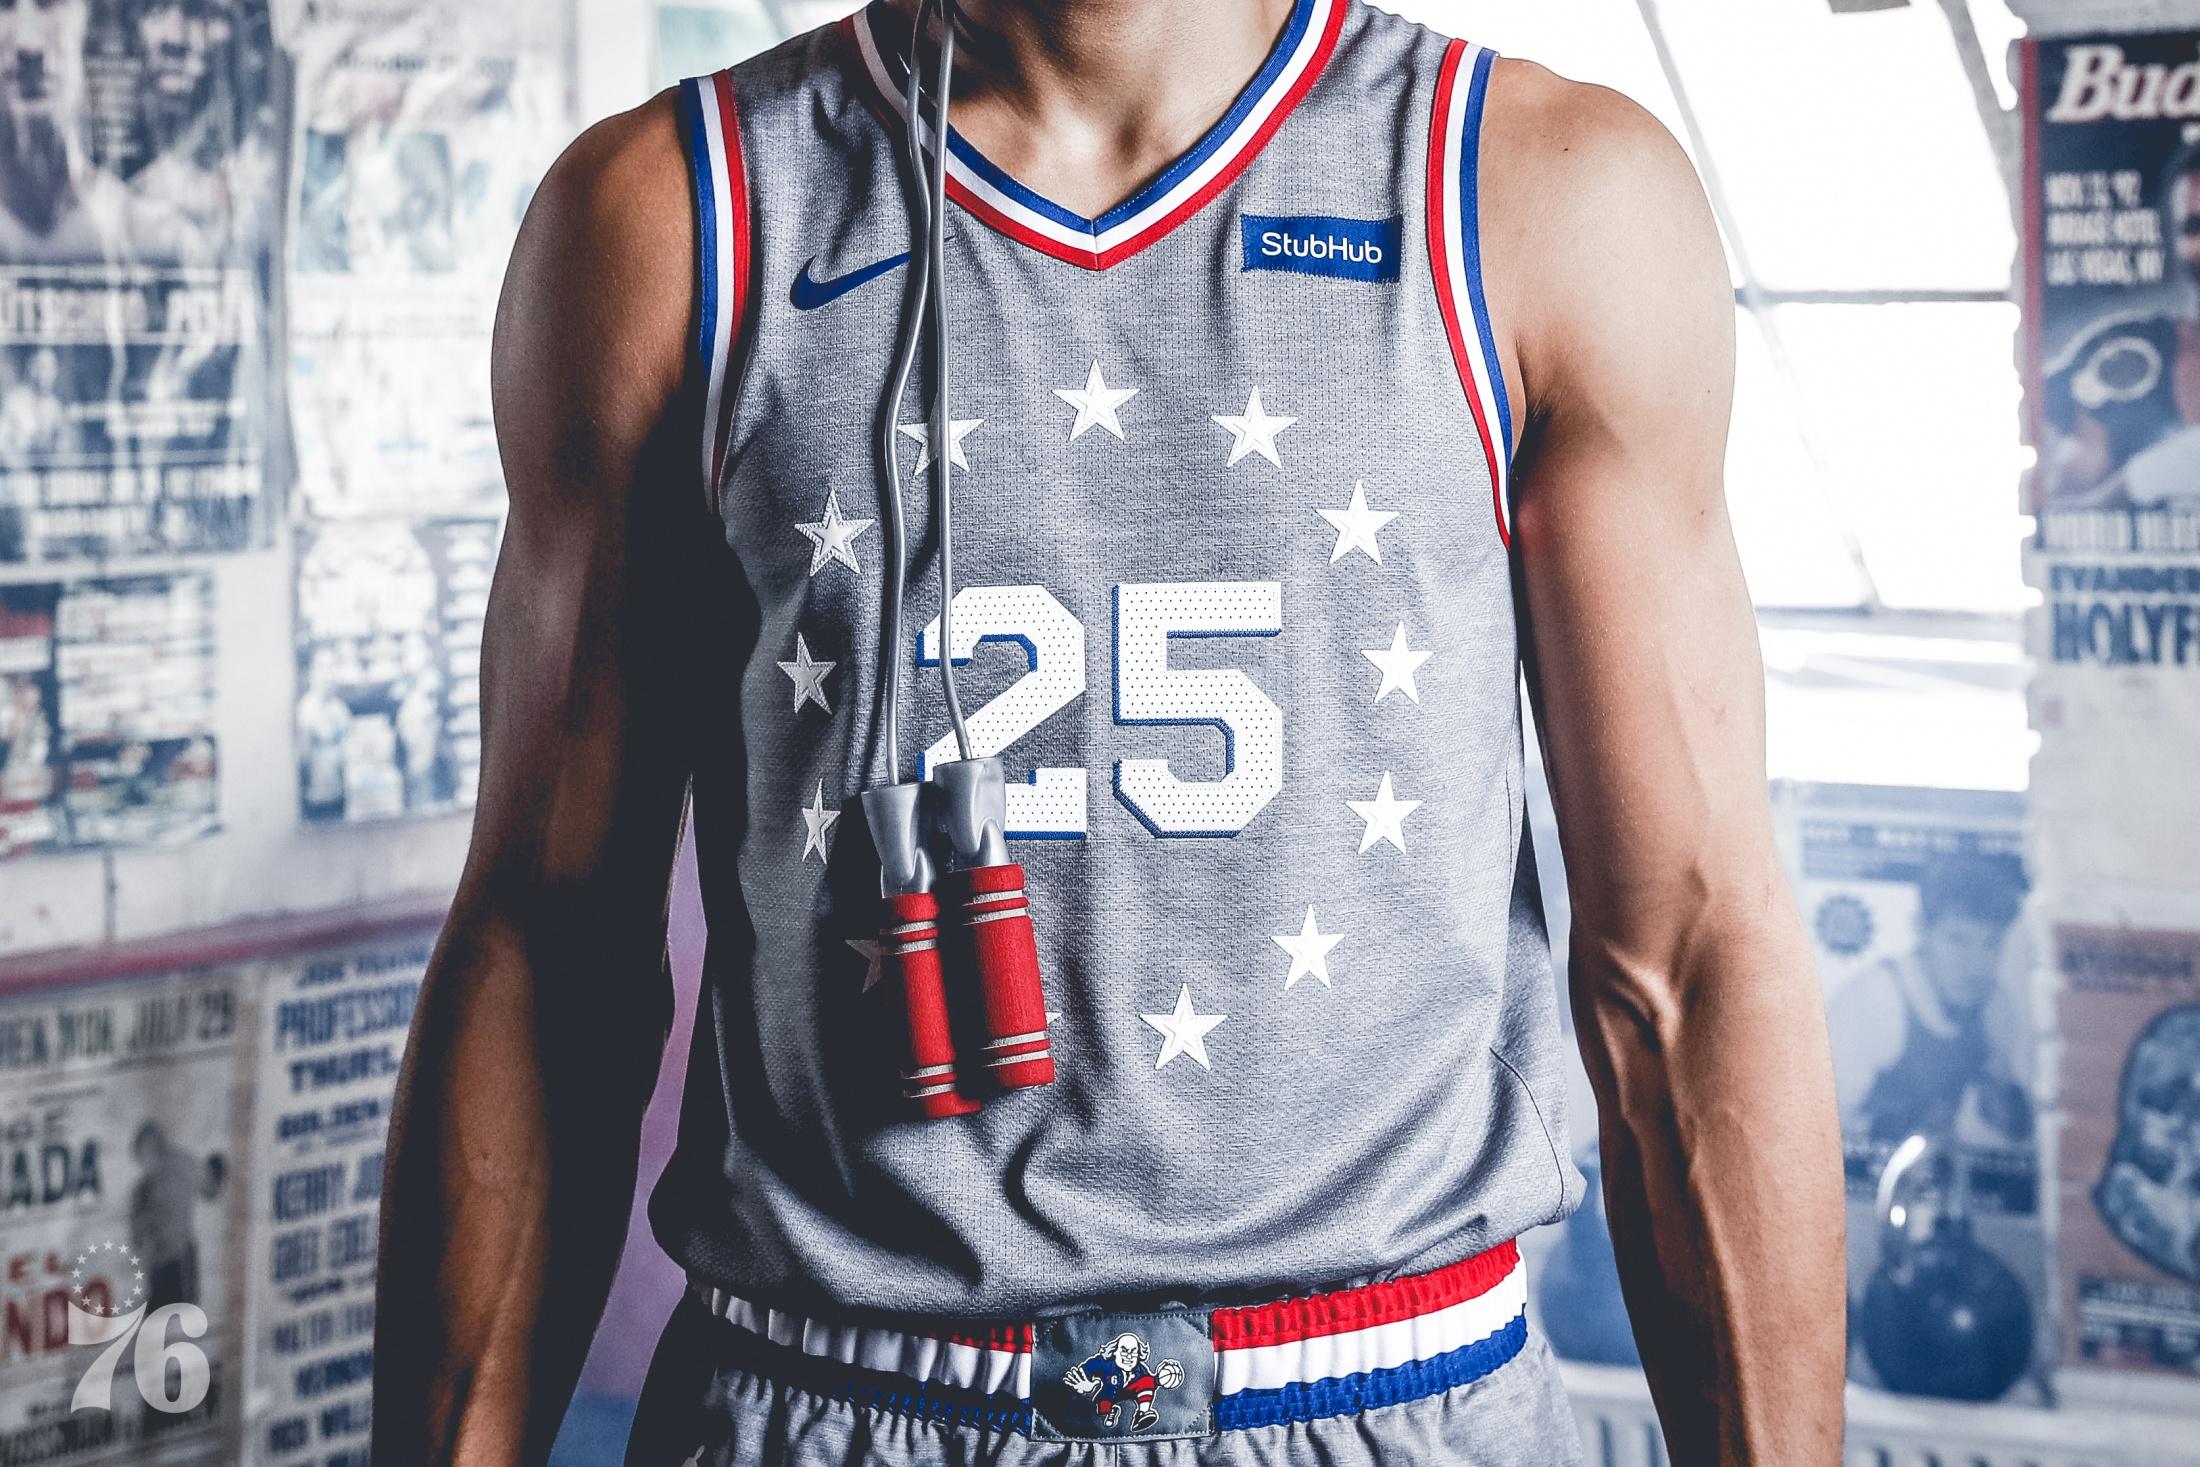 Thumbnail for Philadelphia 76ers - City Edition - 2018 City Edition Partnership